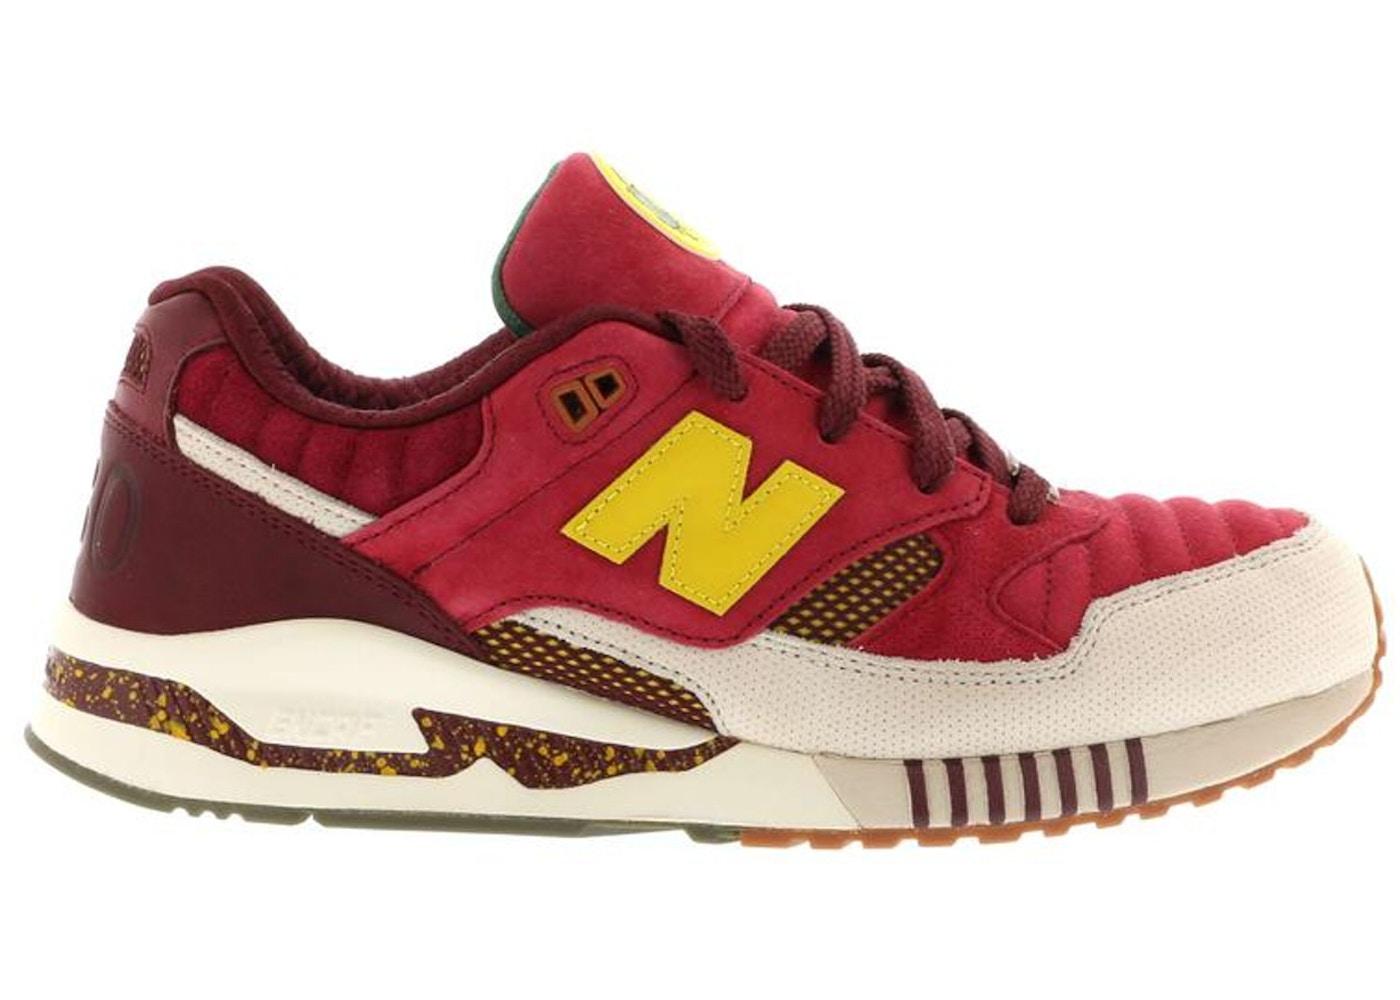 official photos 64e1f 79ce0 New Balance Size 7.5 Shoes - New Lowest Asks